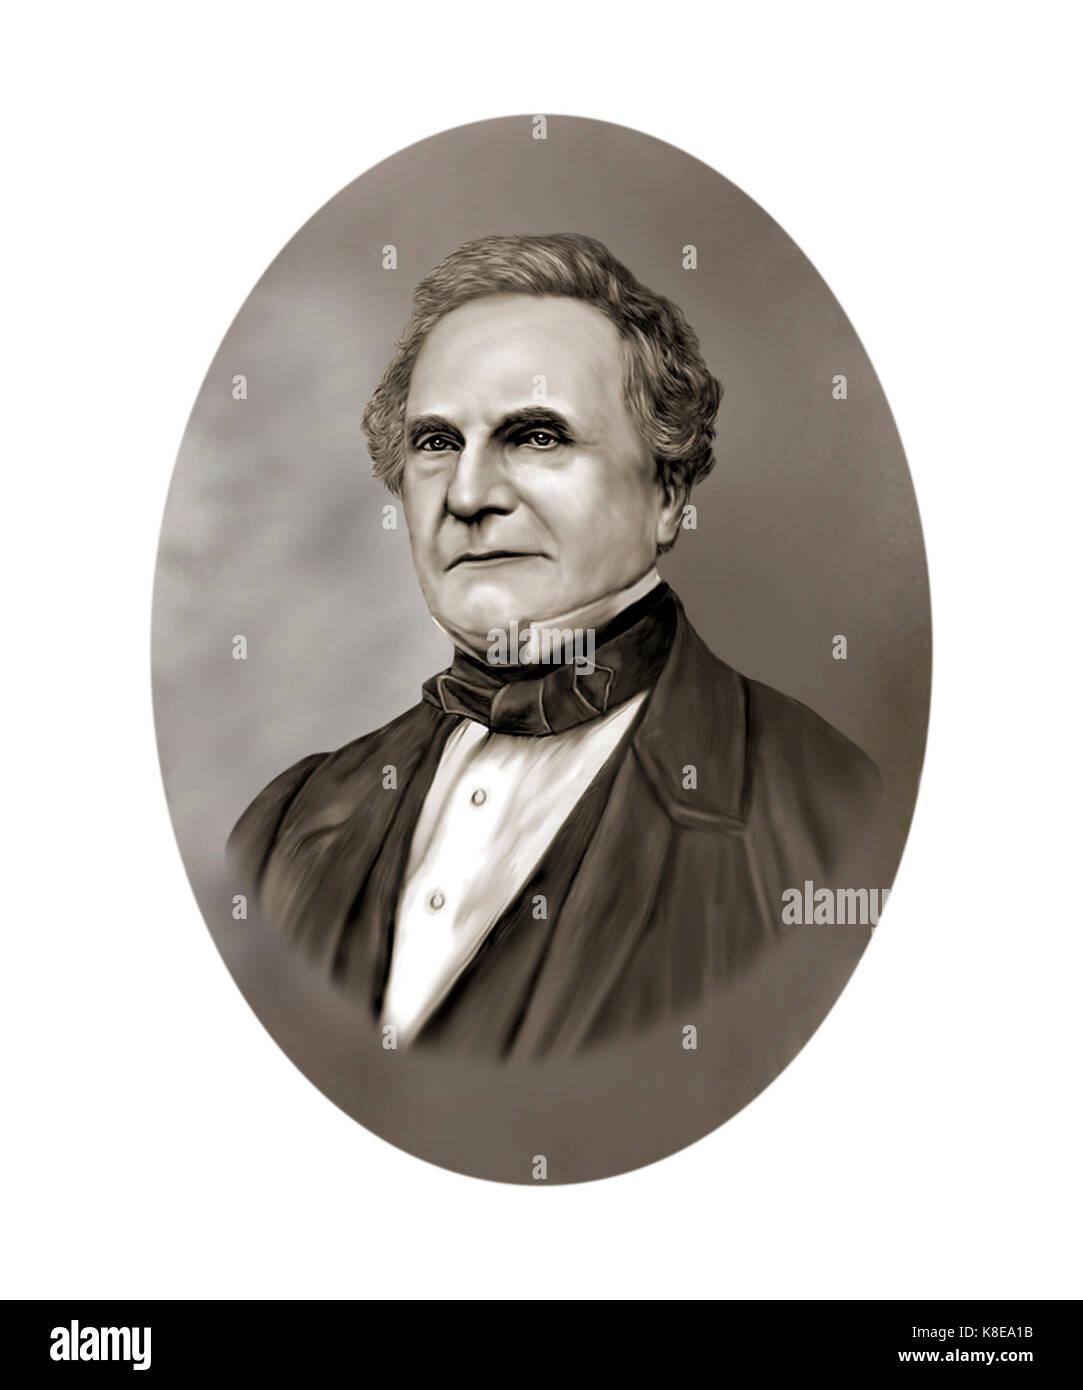 Charles Babbage, 1791 - 1871, Mathematician, Polymath, Philosopher, Inventor, Mechanical Engineer - Stock Image